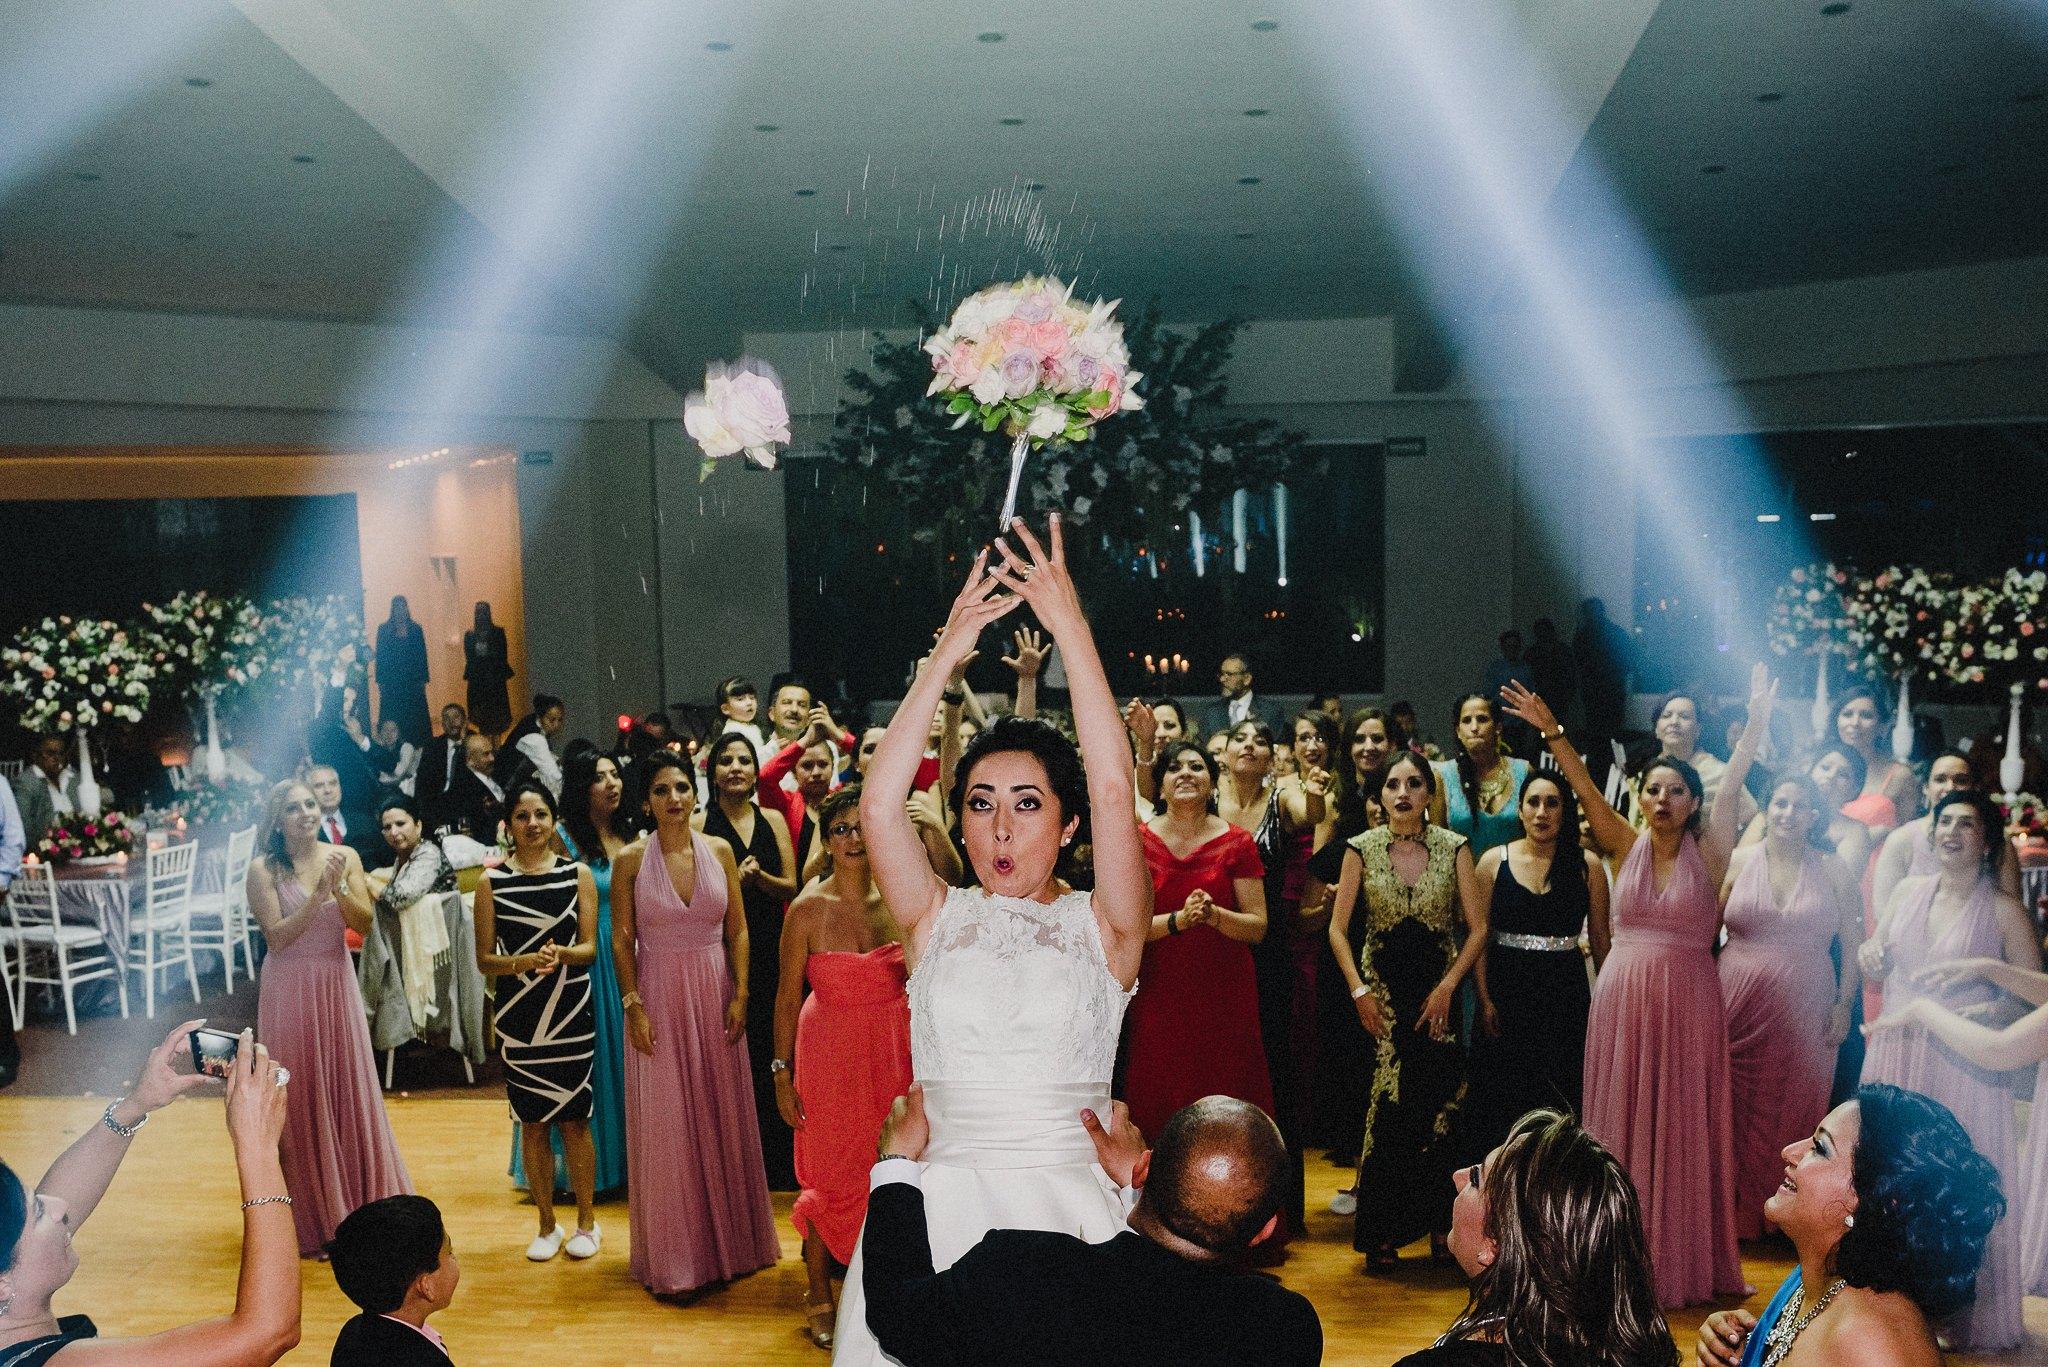 Wedding-Boda-Tulancingo-Hidalgo-Salon-Essenzia-Luis-Houdin-67-film